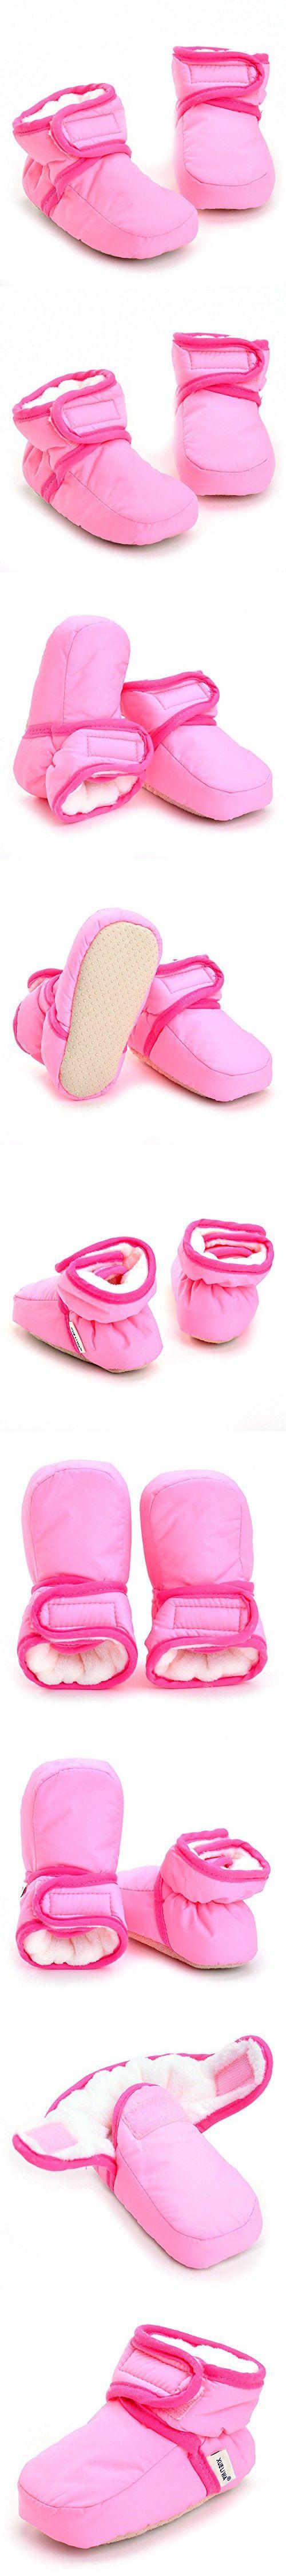 Enteer Infant Waterproof Snow Boots Premium Soft Sole Anti-Slip Warm Winter Prewalker Toddler Boots (3-6months, pink)